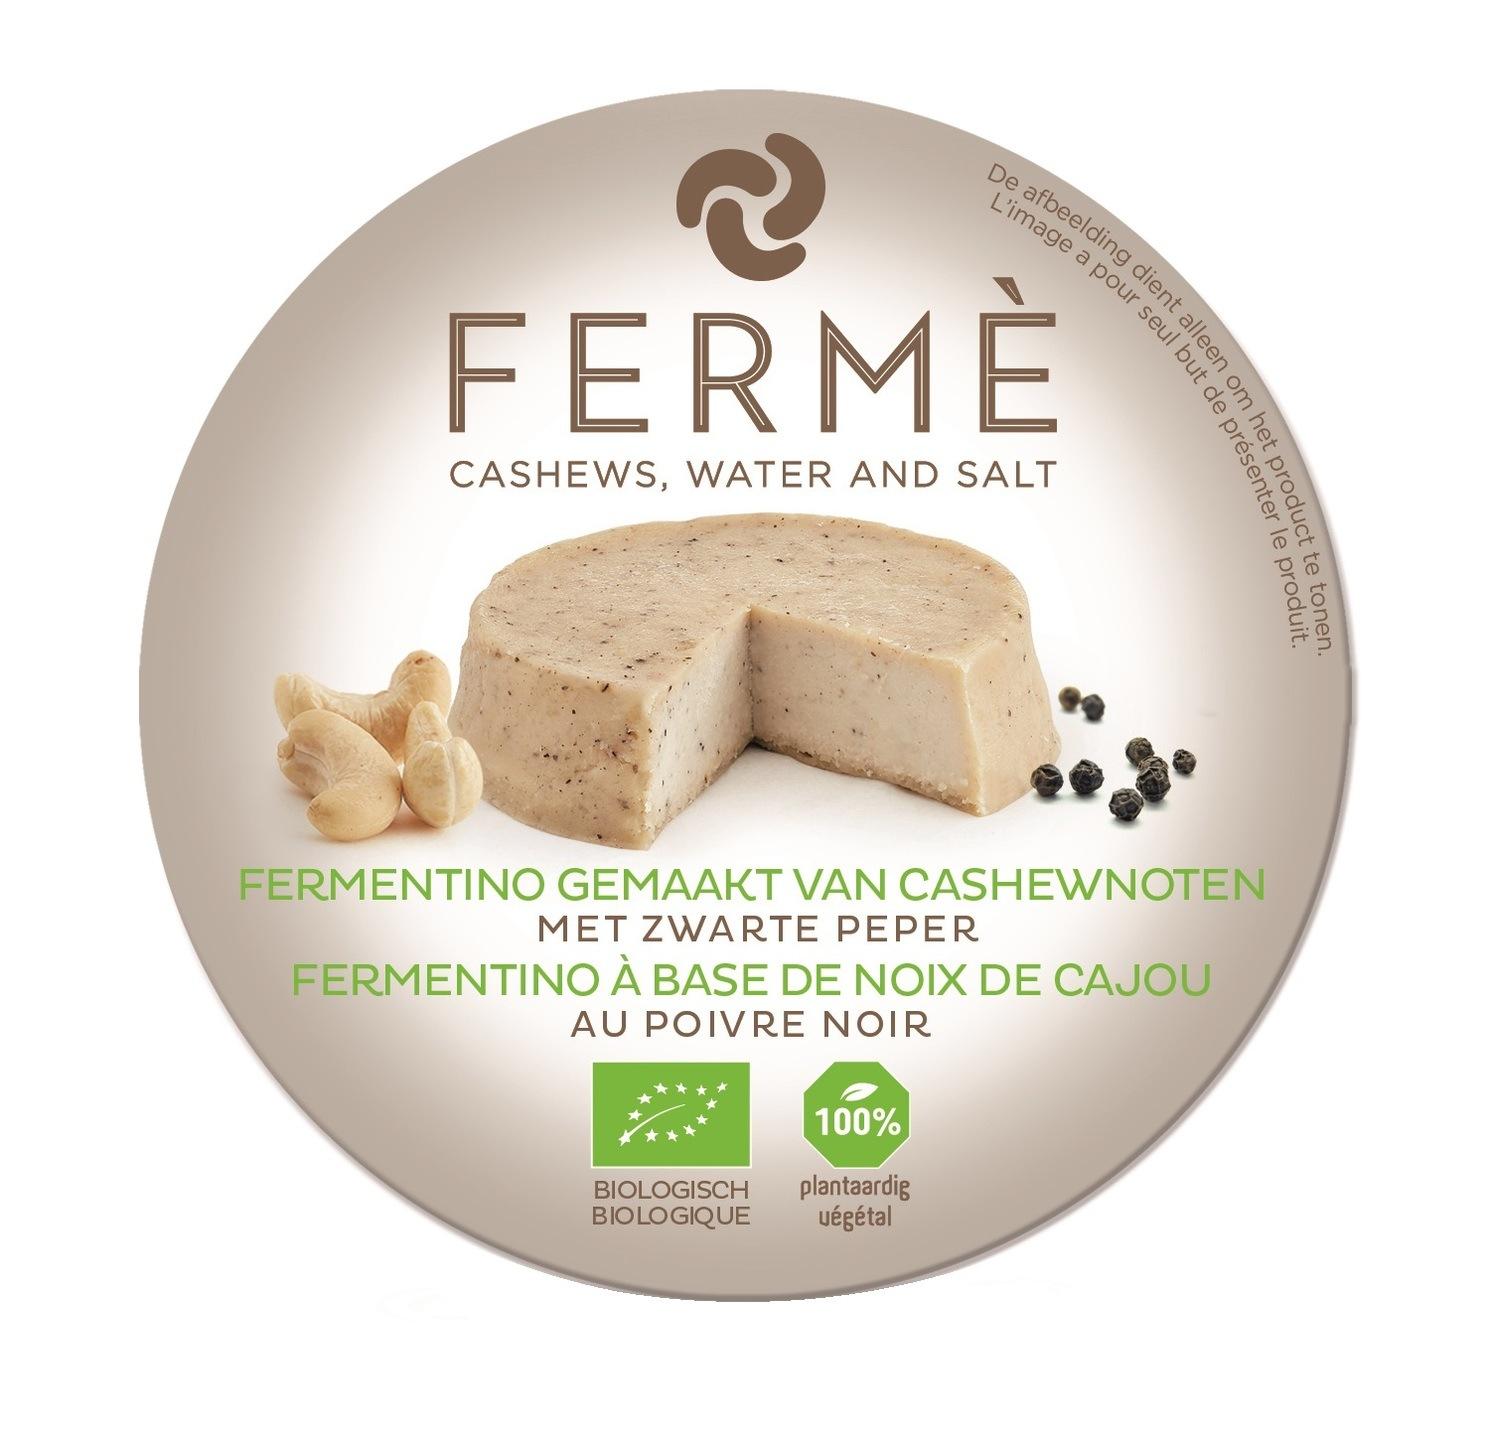 Biologische Fermé Cashew fermentino met zwarte peper 90 gr